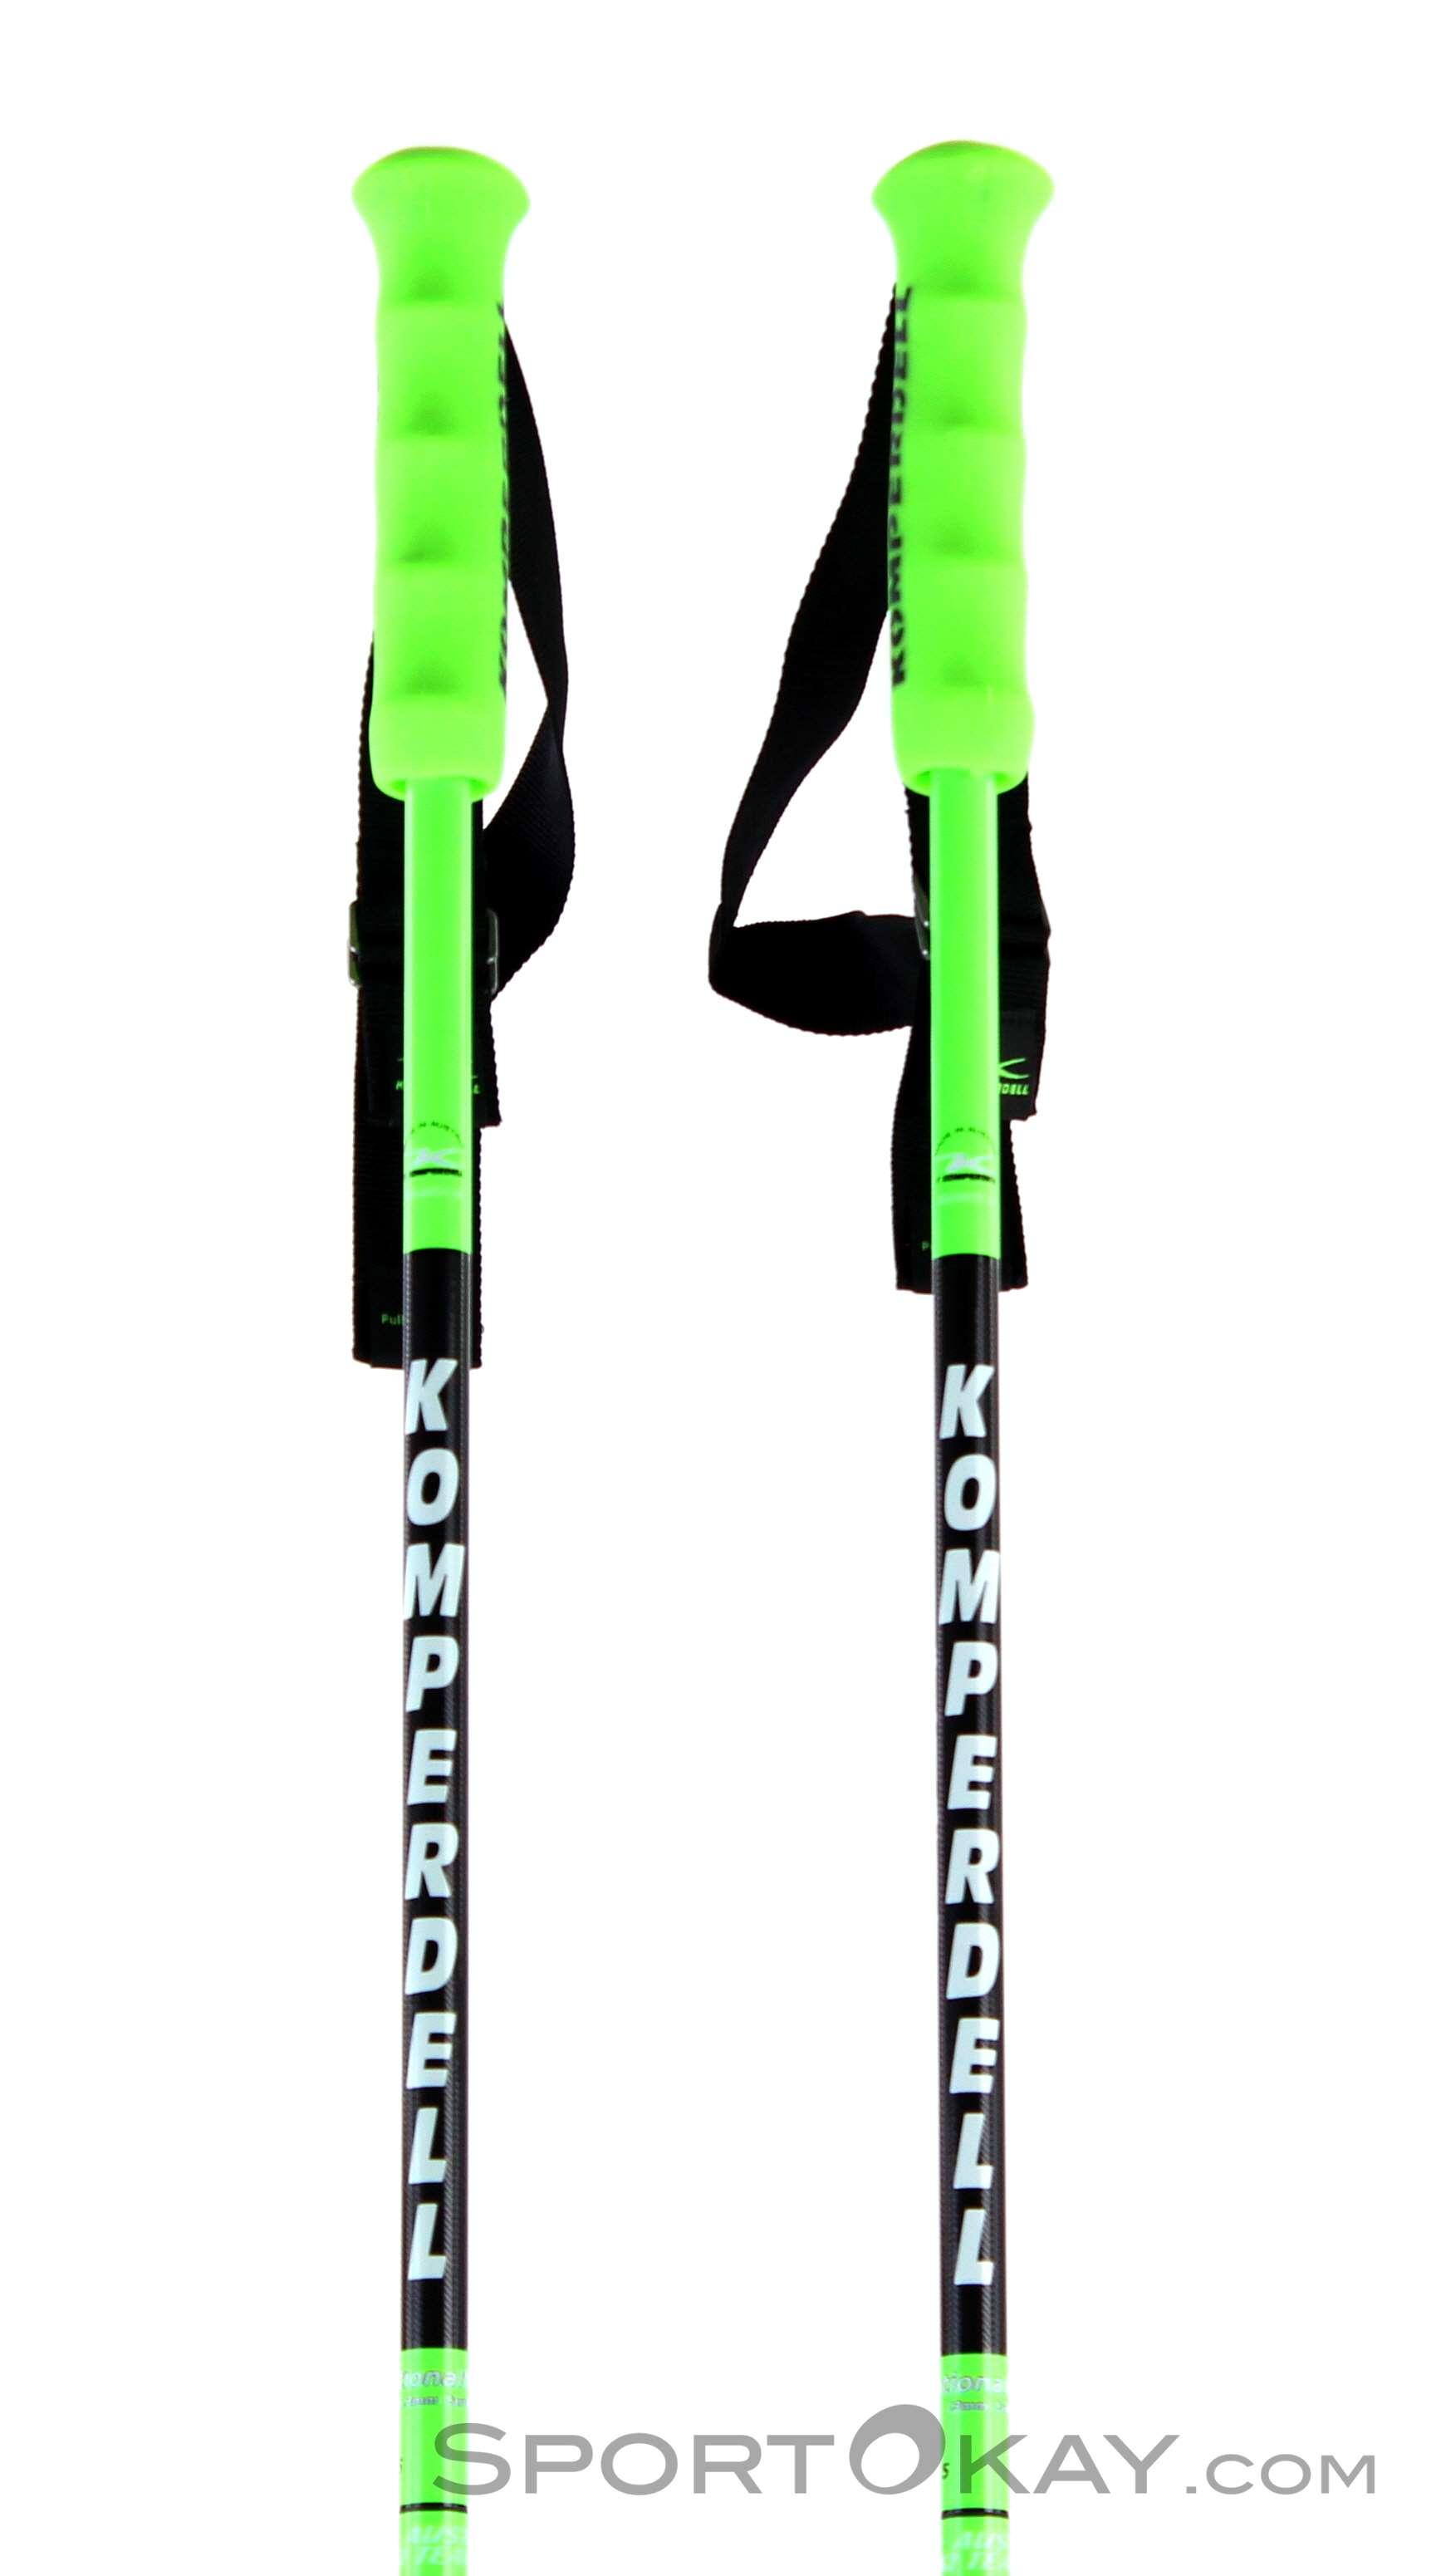 Komperdell Nationalteam Carbon Skistöcke-Grün-125